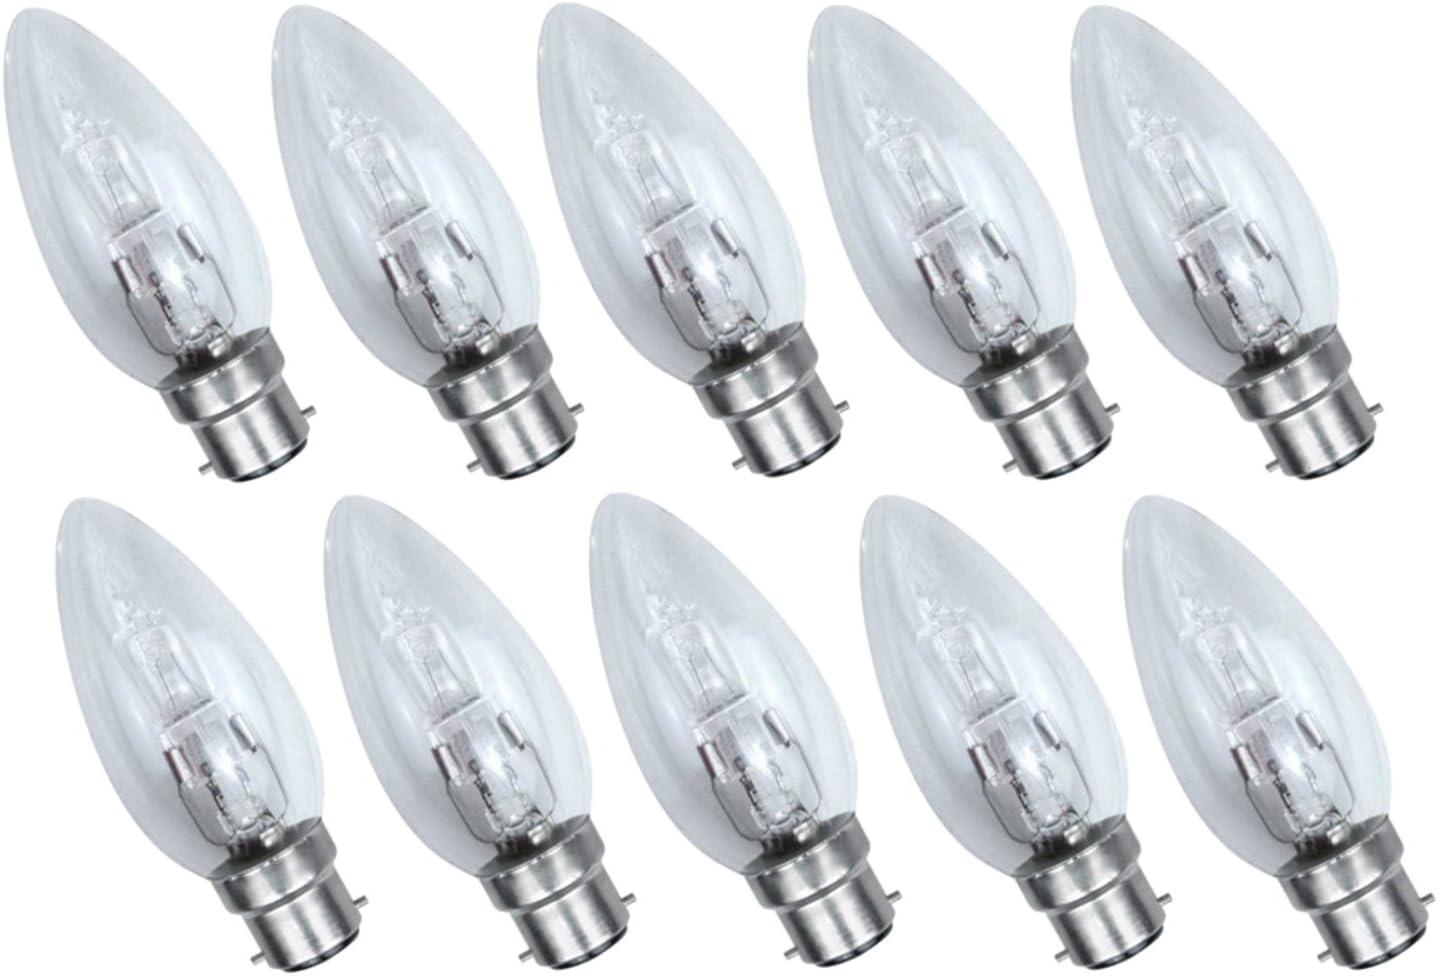 Luminizer 3120 Lot de 10 bougies halog/ènes B22 C35 42 W /à intensit/é variable Blanc chaud 55 W